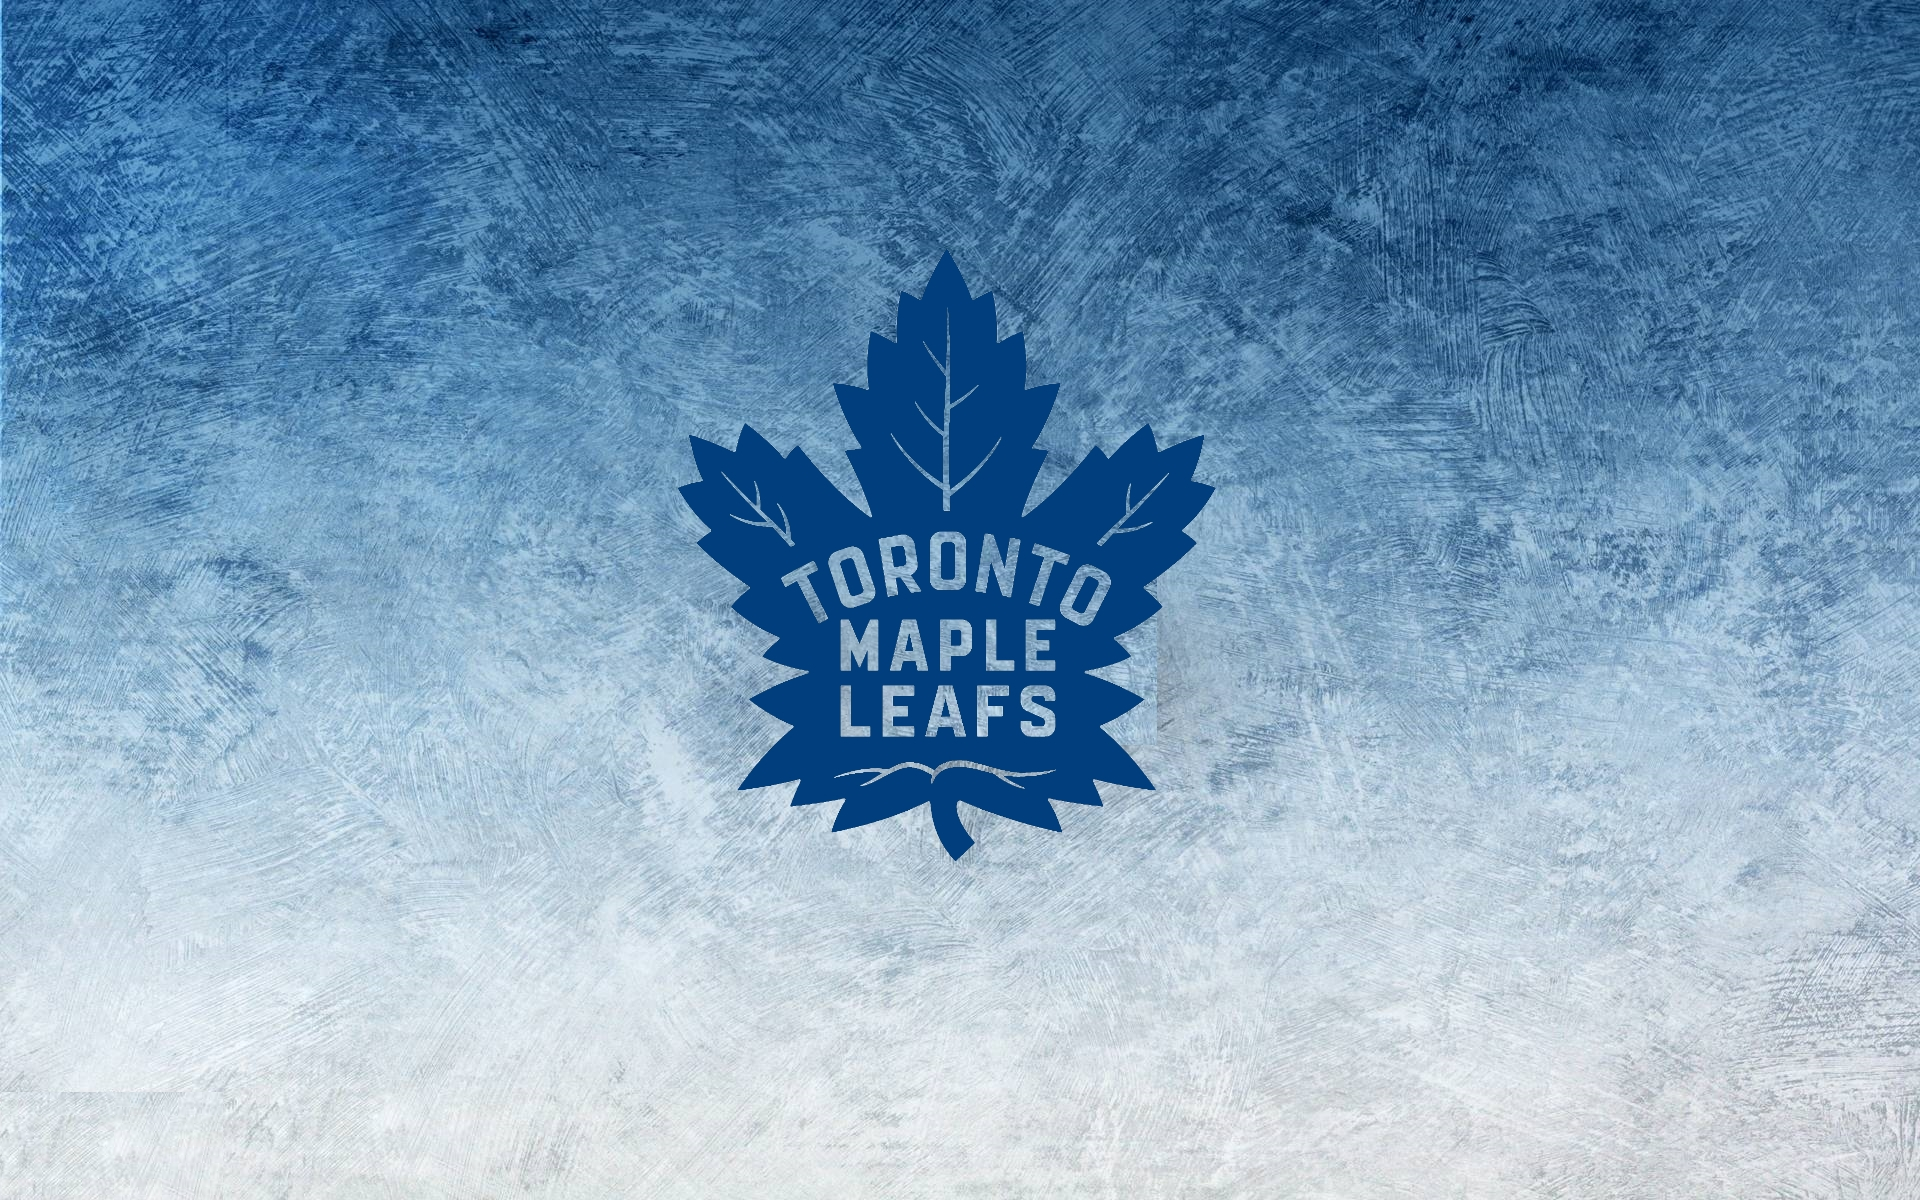 toronto maple leafs logos download leaf logos images leaf logo pictures